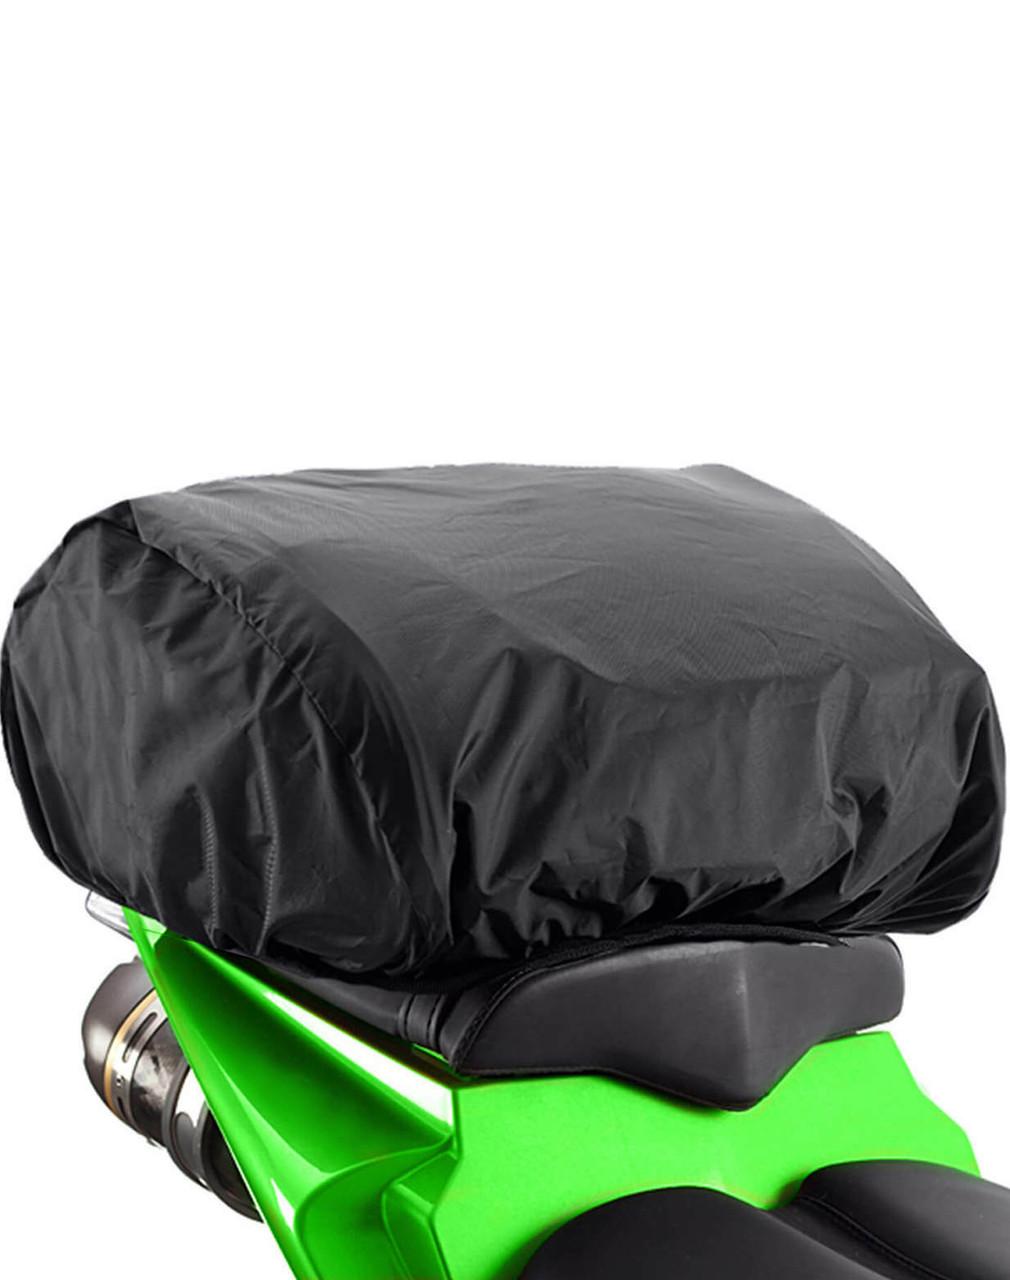 VikingBags Large Honda Motorcycle Tail Bag Rain Cover